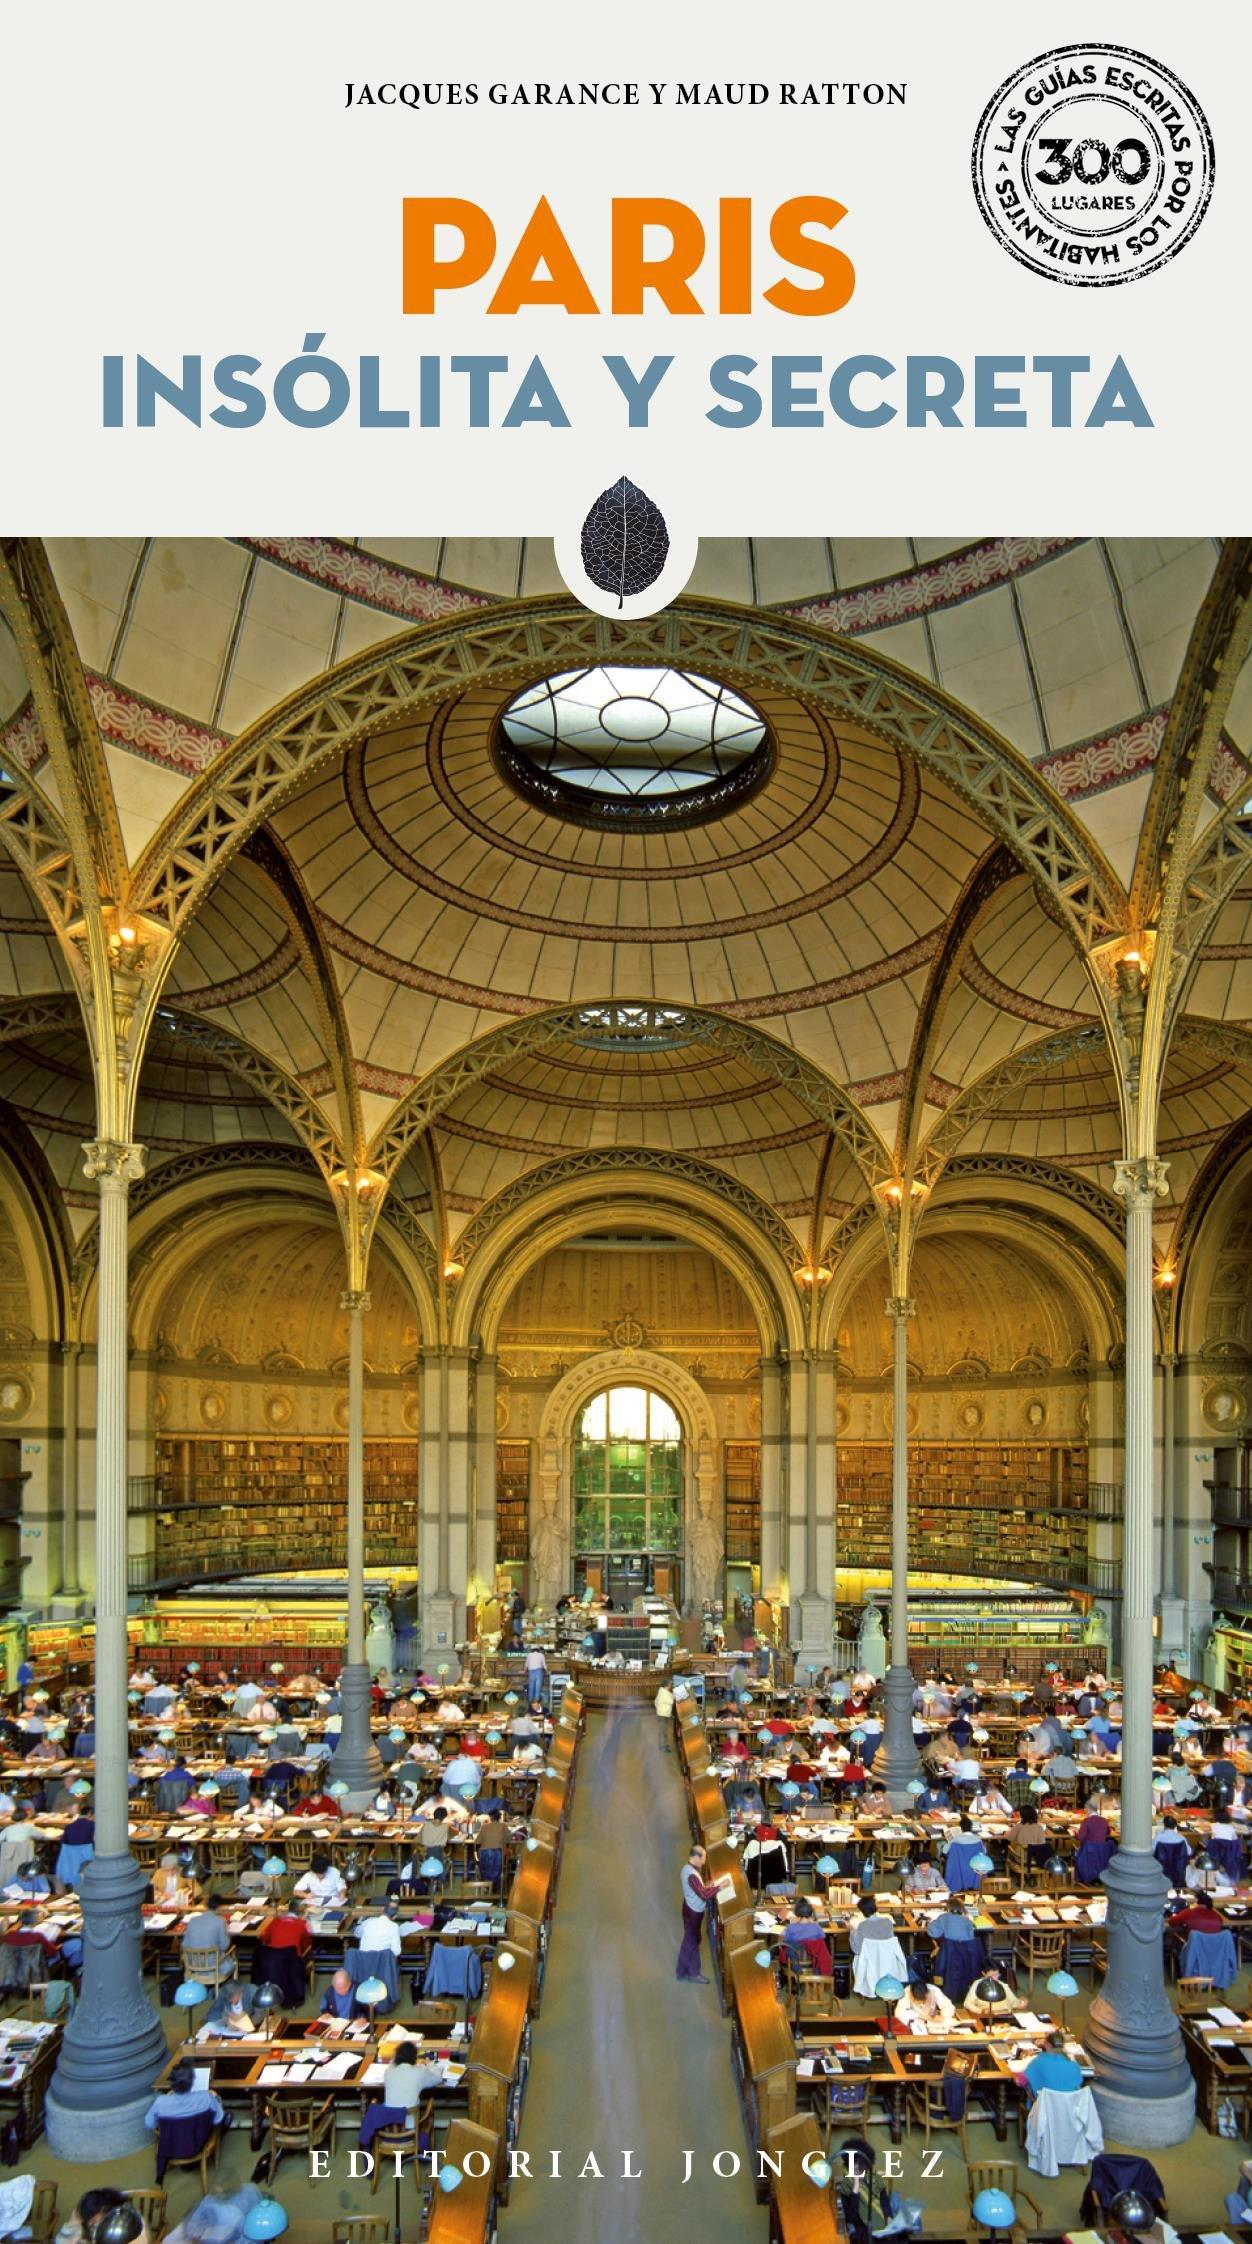 Guía París insólita y secreta Tapa blanda – 1 jul 2013 Garance Jacques EDITORIAL JONGLEZ 2361950456 Paris (France);Guidebooks.